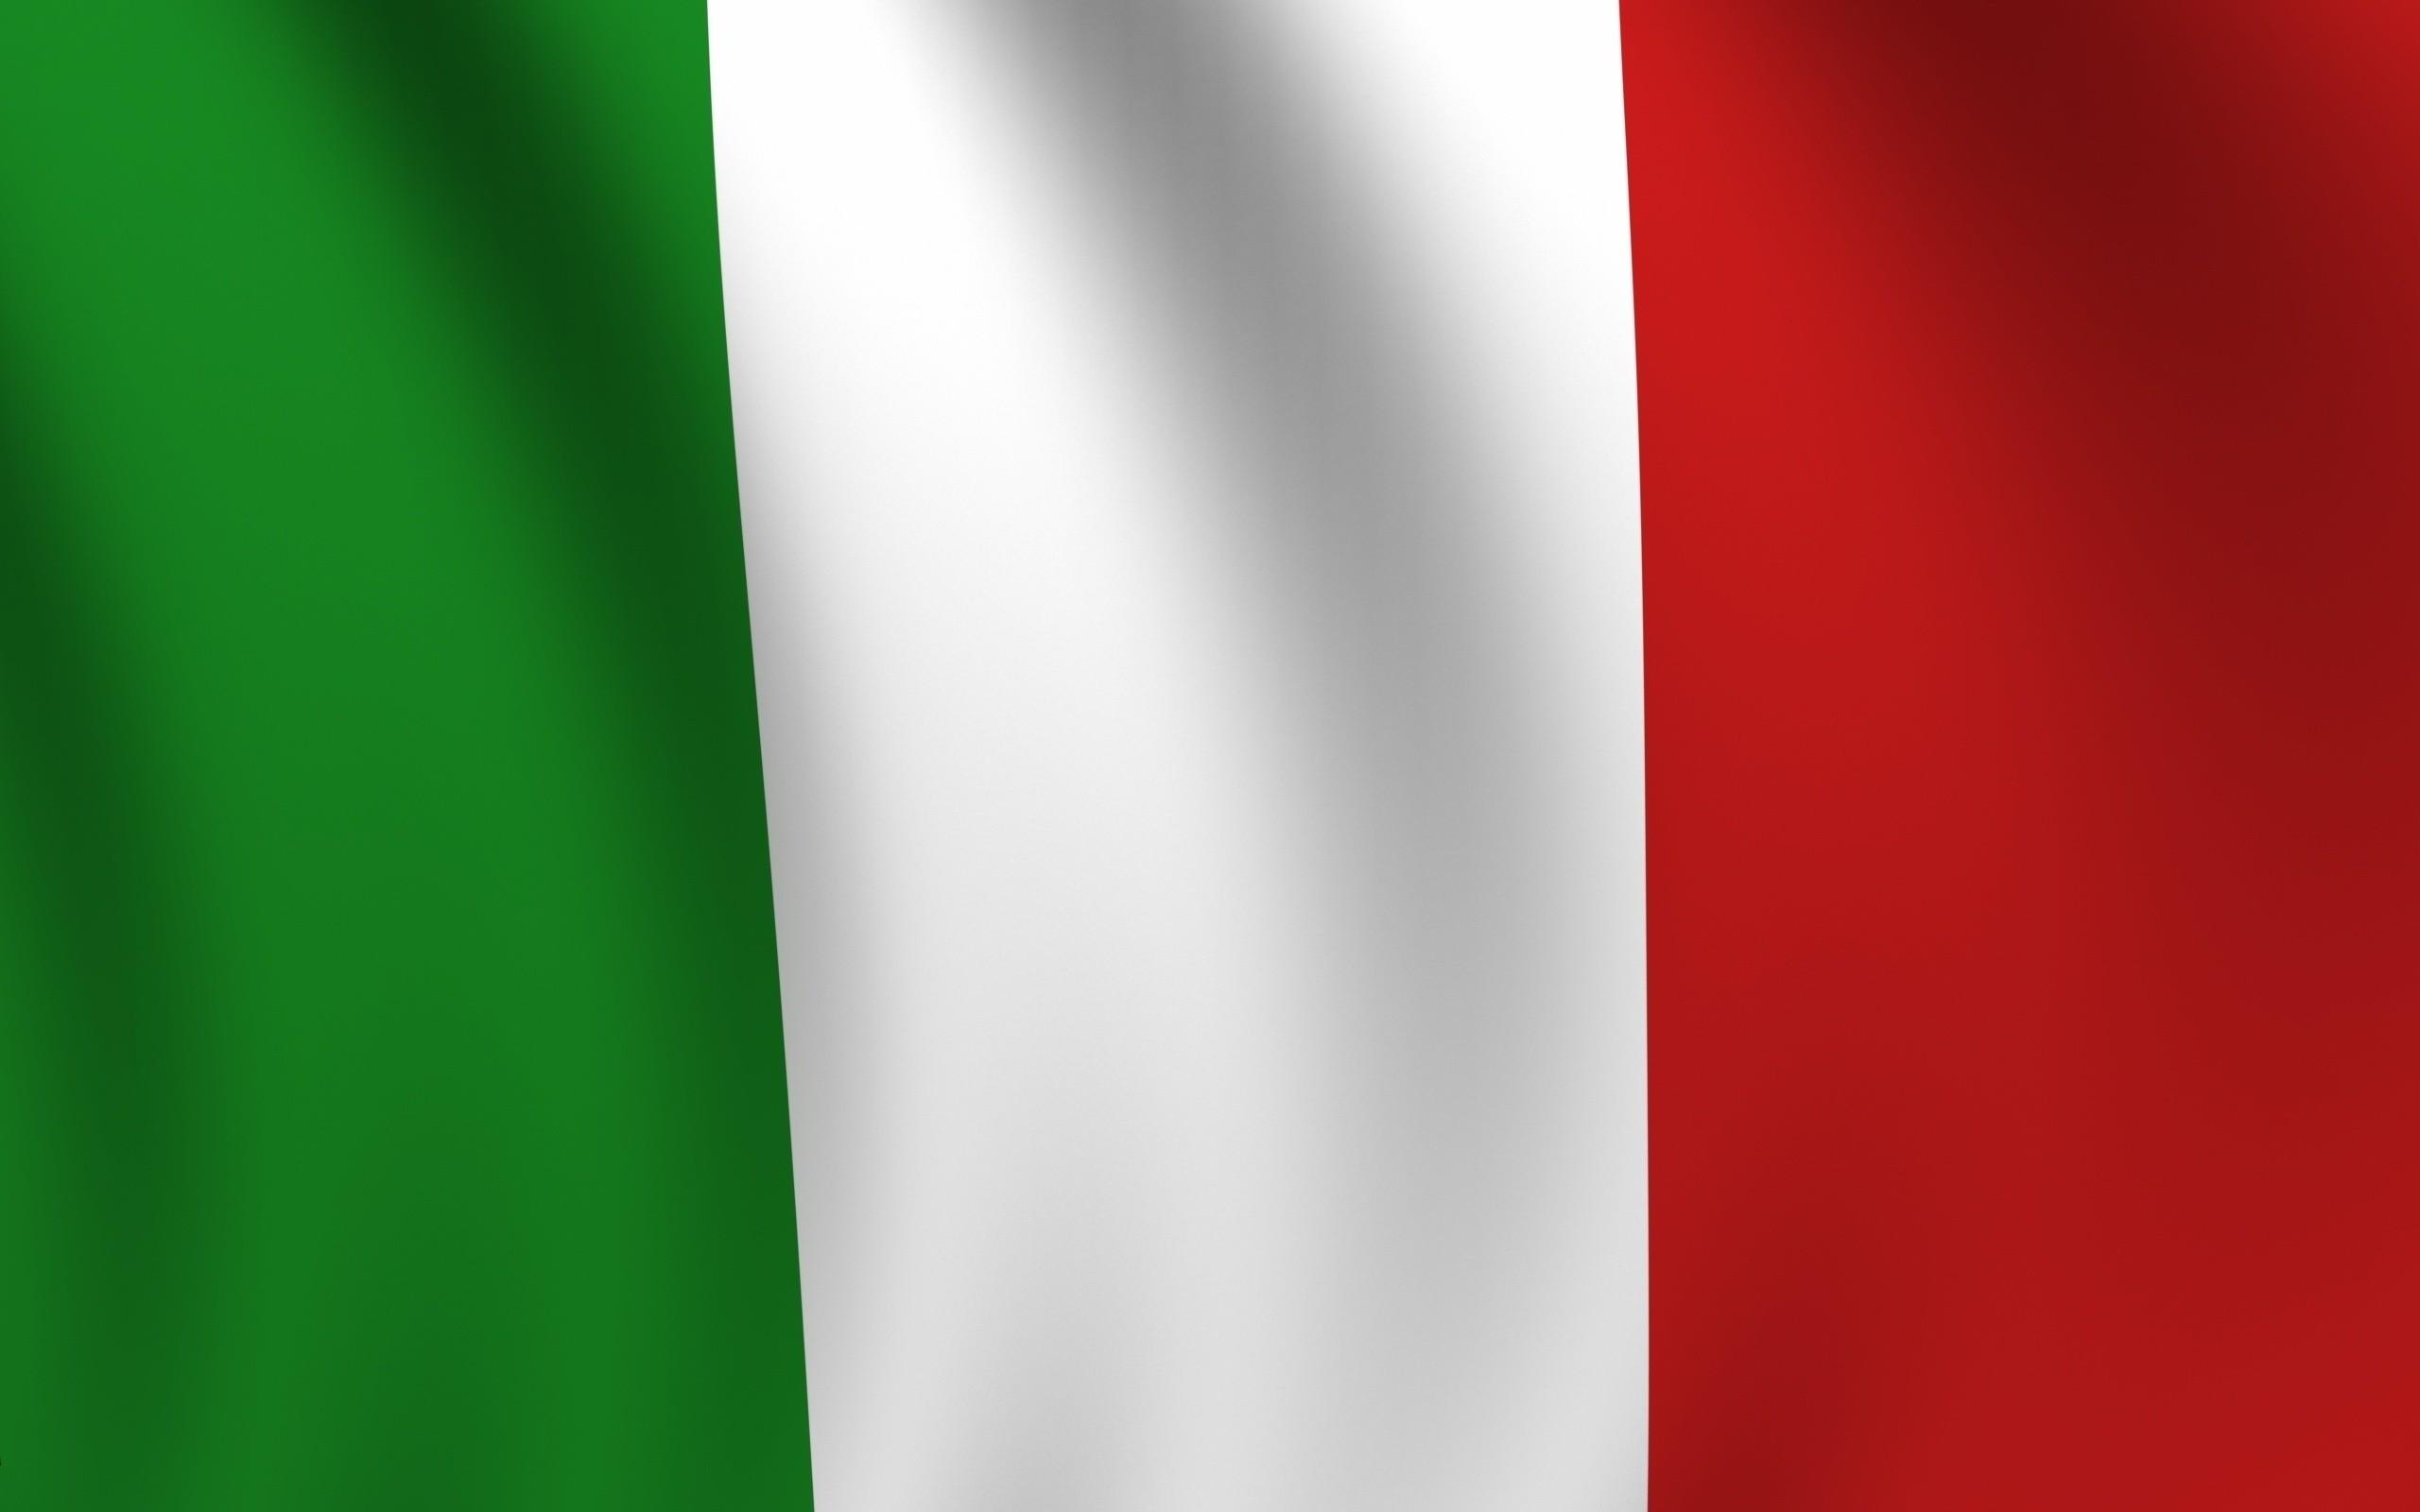 Italian Flag Iphone Wallpaper 60 Images